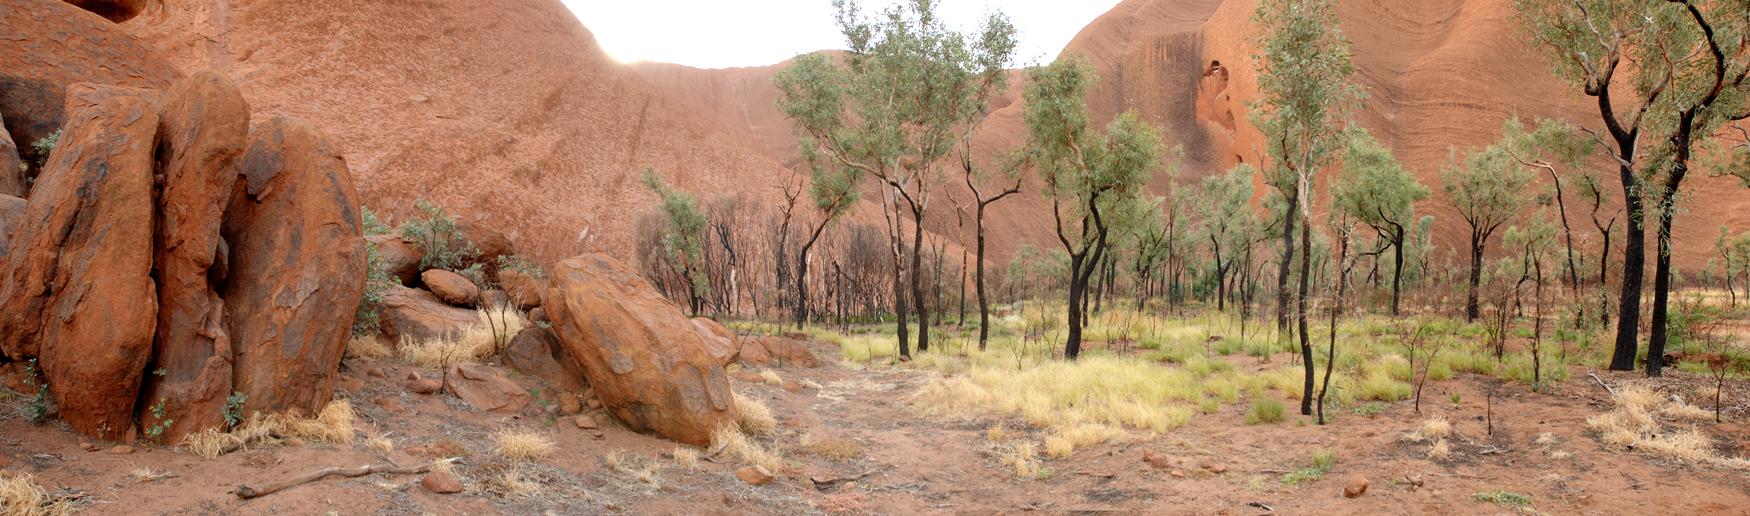 Bäume am Uluru Ayers Rock Northern Territory Australien Header